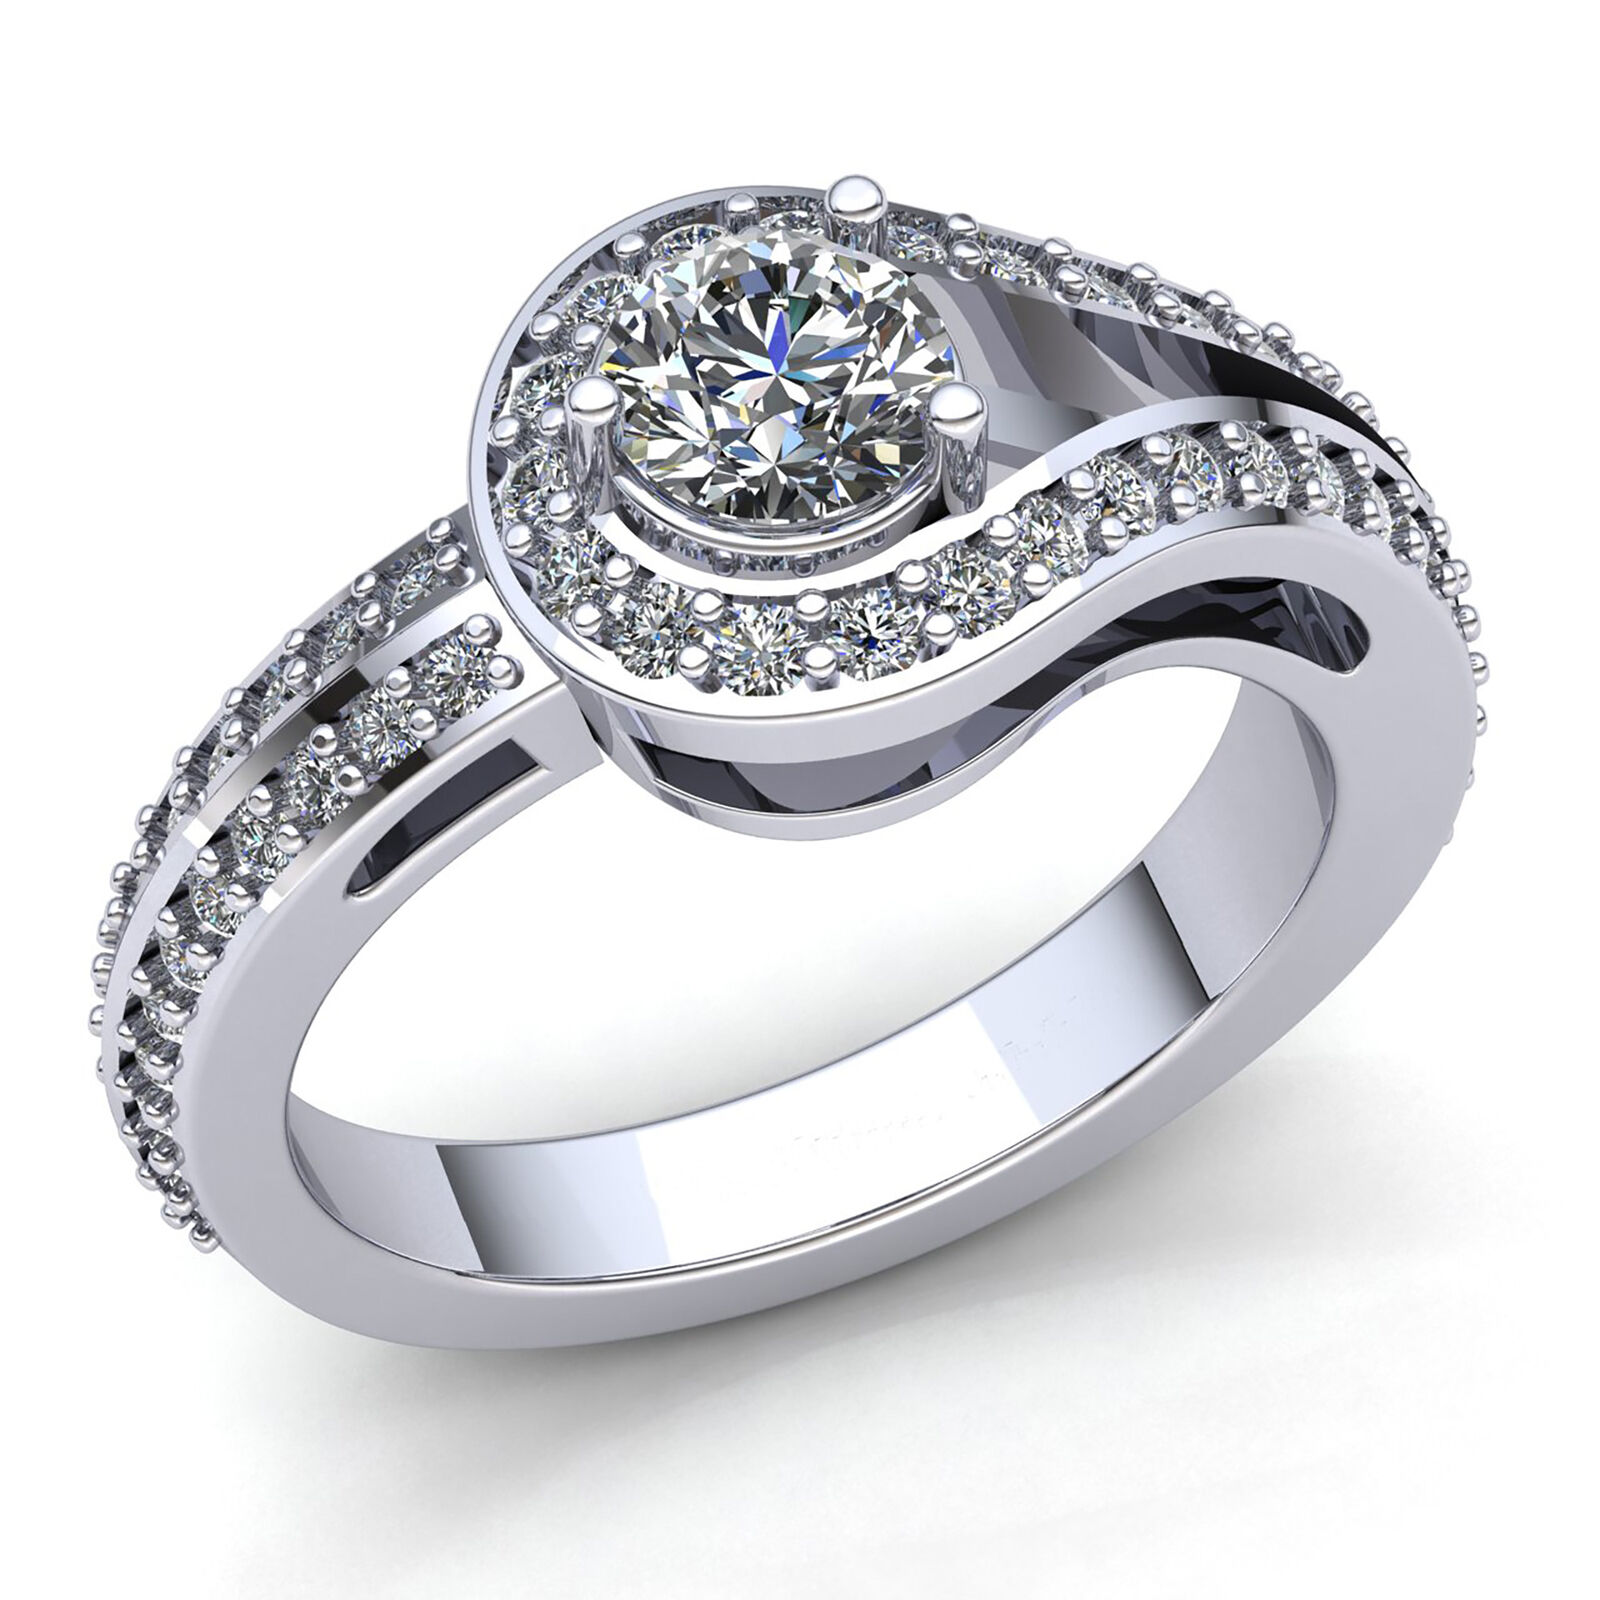 1ctw Round Cut Diamond Ladies Bridal Accent Solitaire Engagement Ring 14K gold